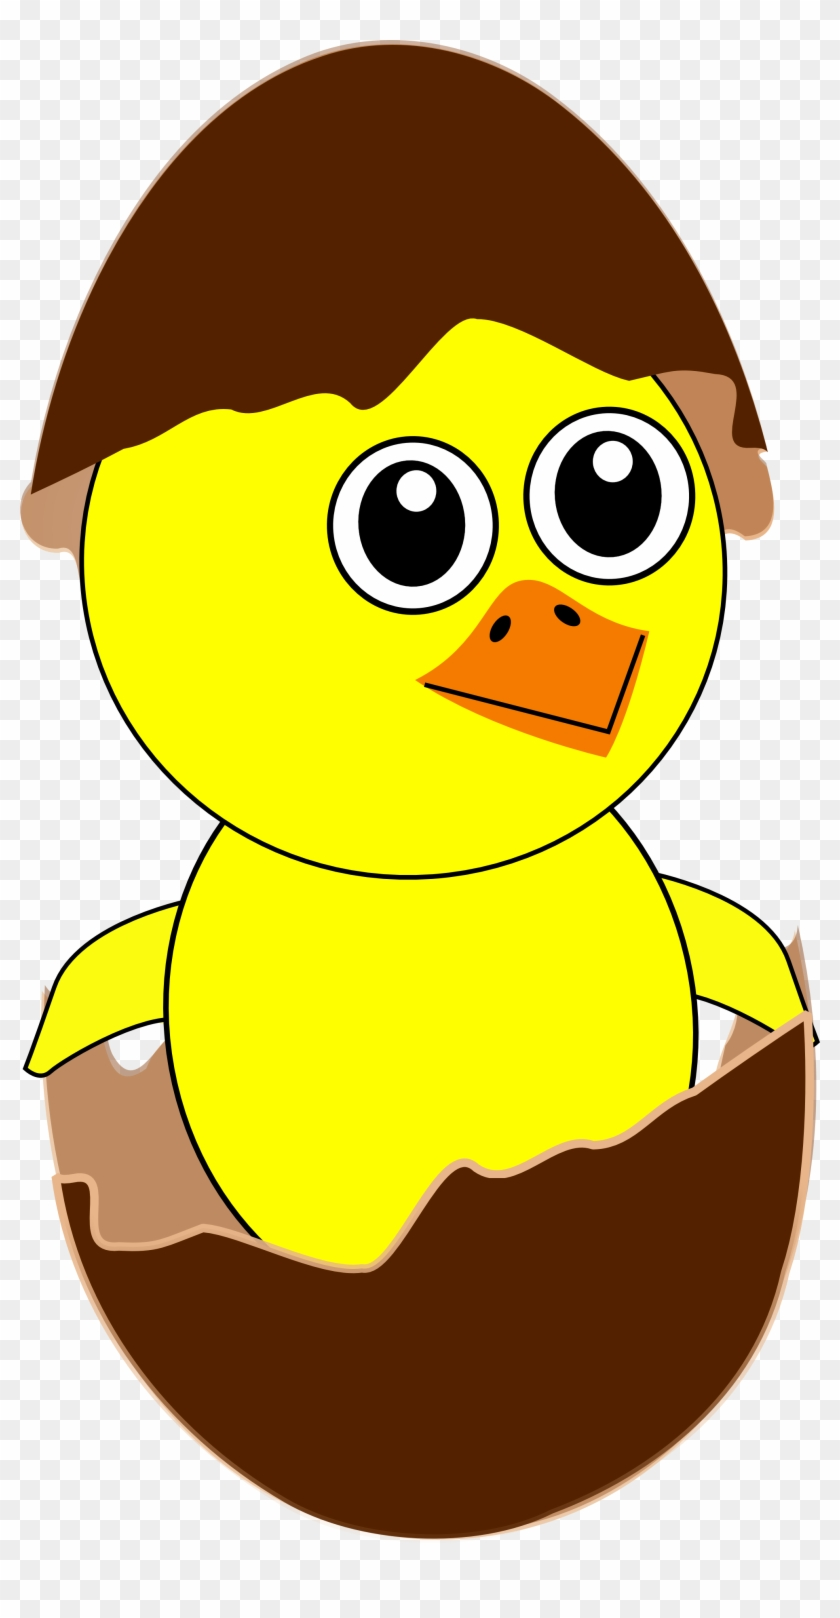 Egg Clipart Clip Art Clipart Panda - Cartoon Chocolate Easter Egg #106874